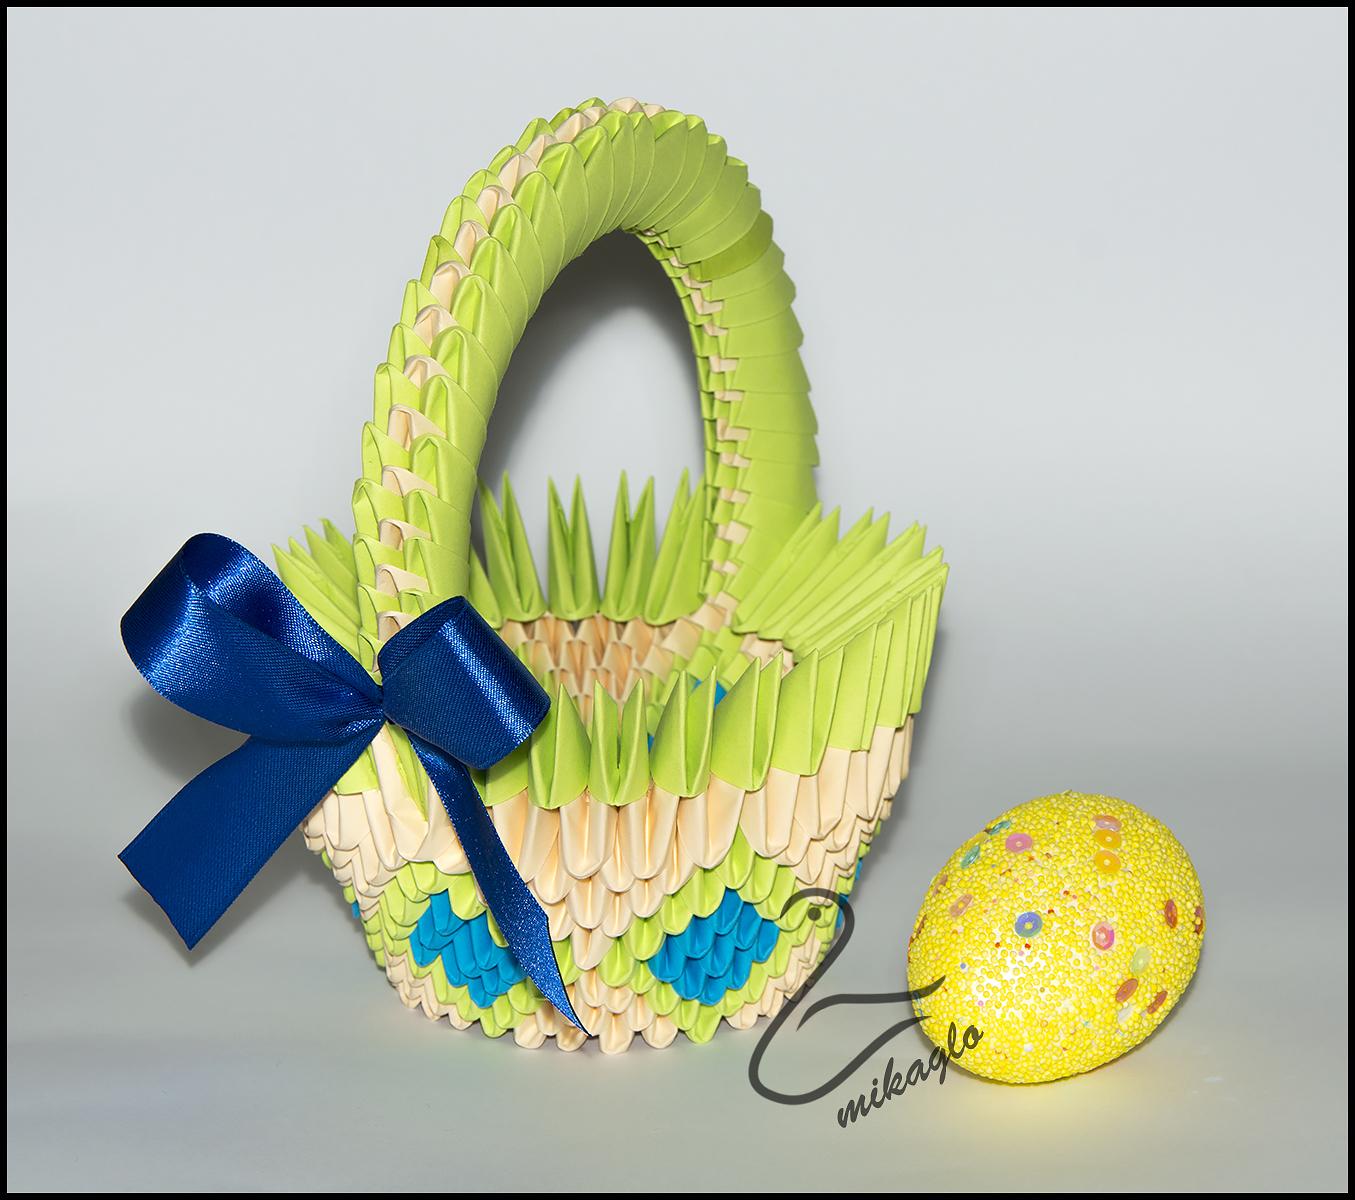 3d origami flower basket tutorial | 3d origami anleitung ... | 1200x1355